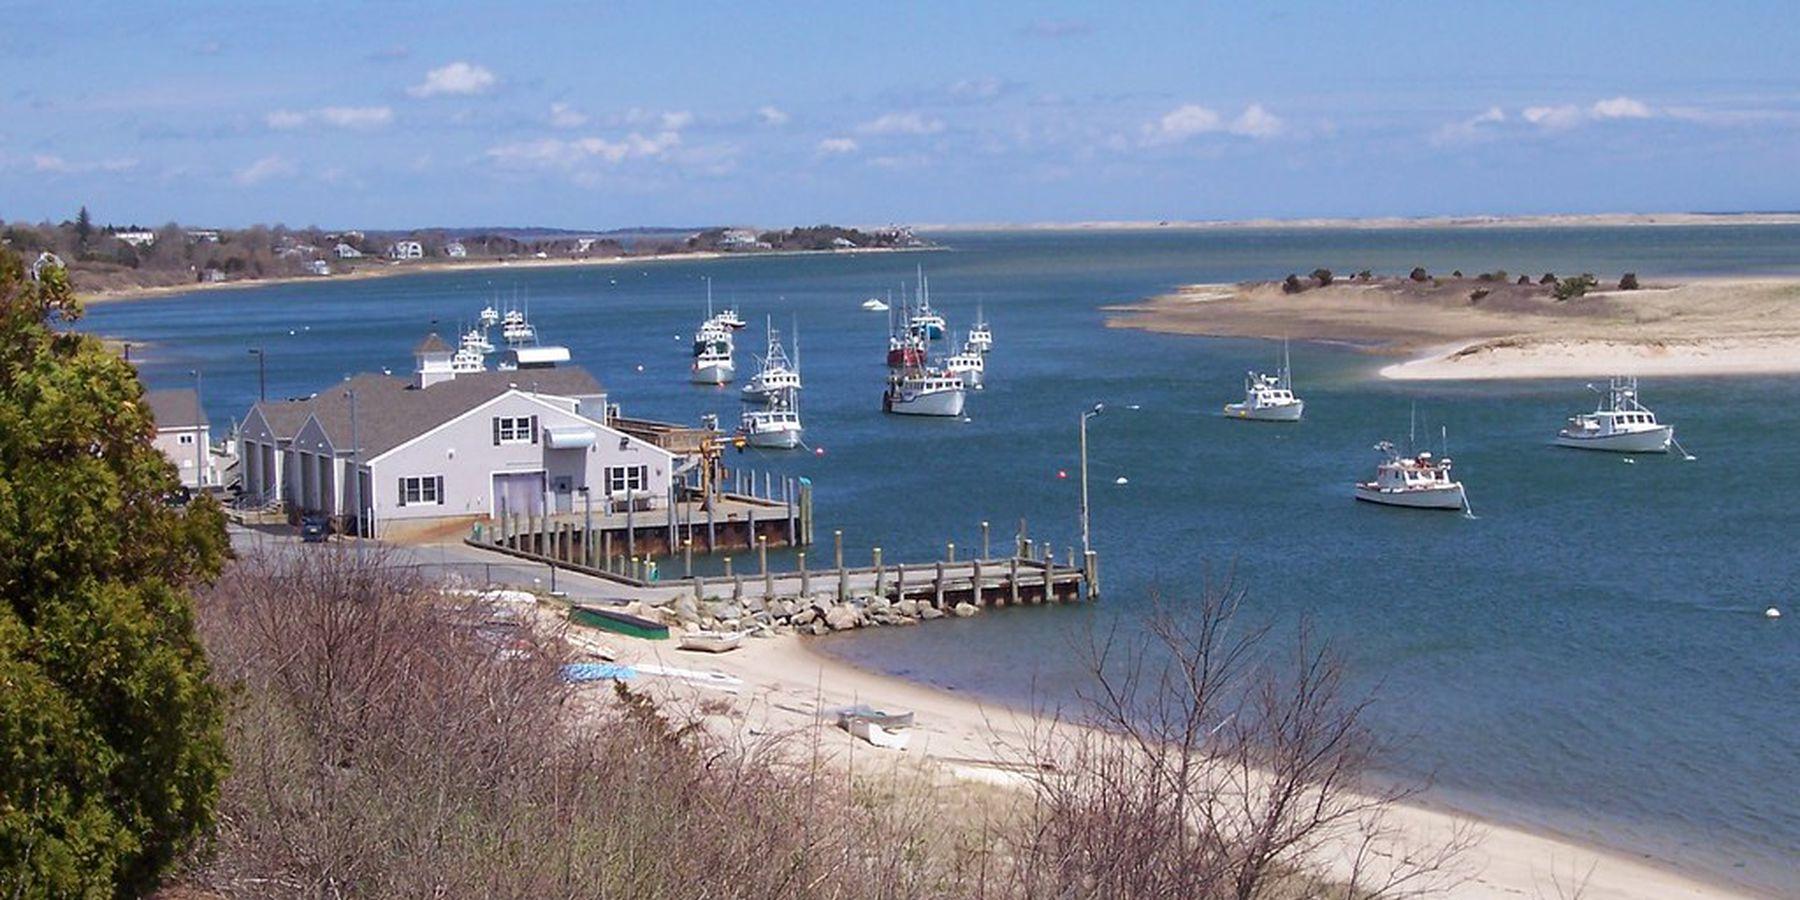 Chatham - Cape Cod - Massachusetts - Doets Reizen